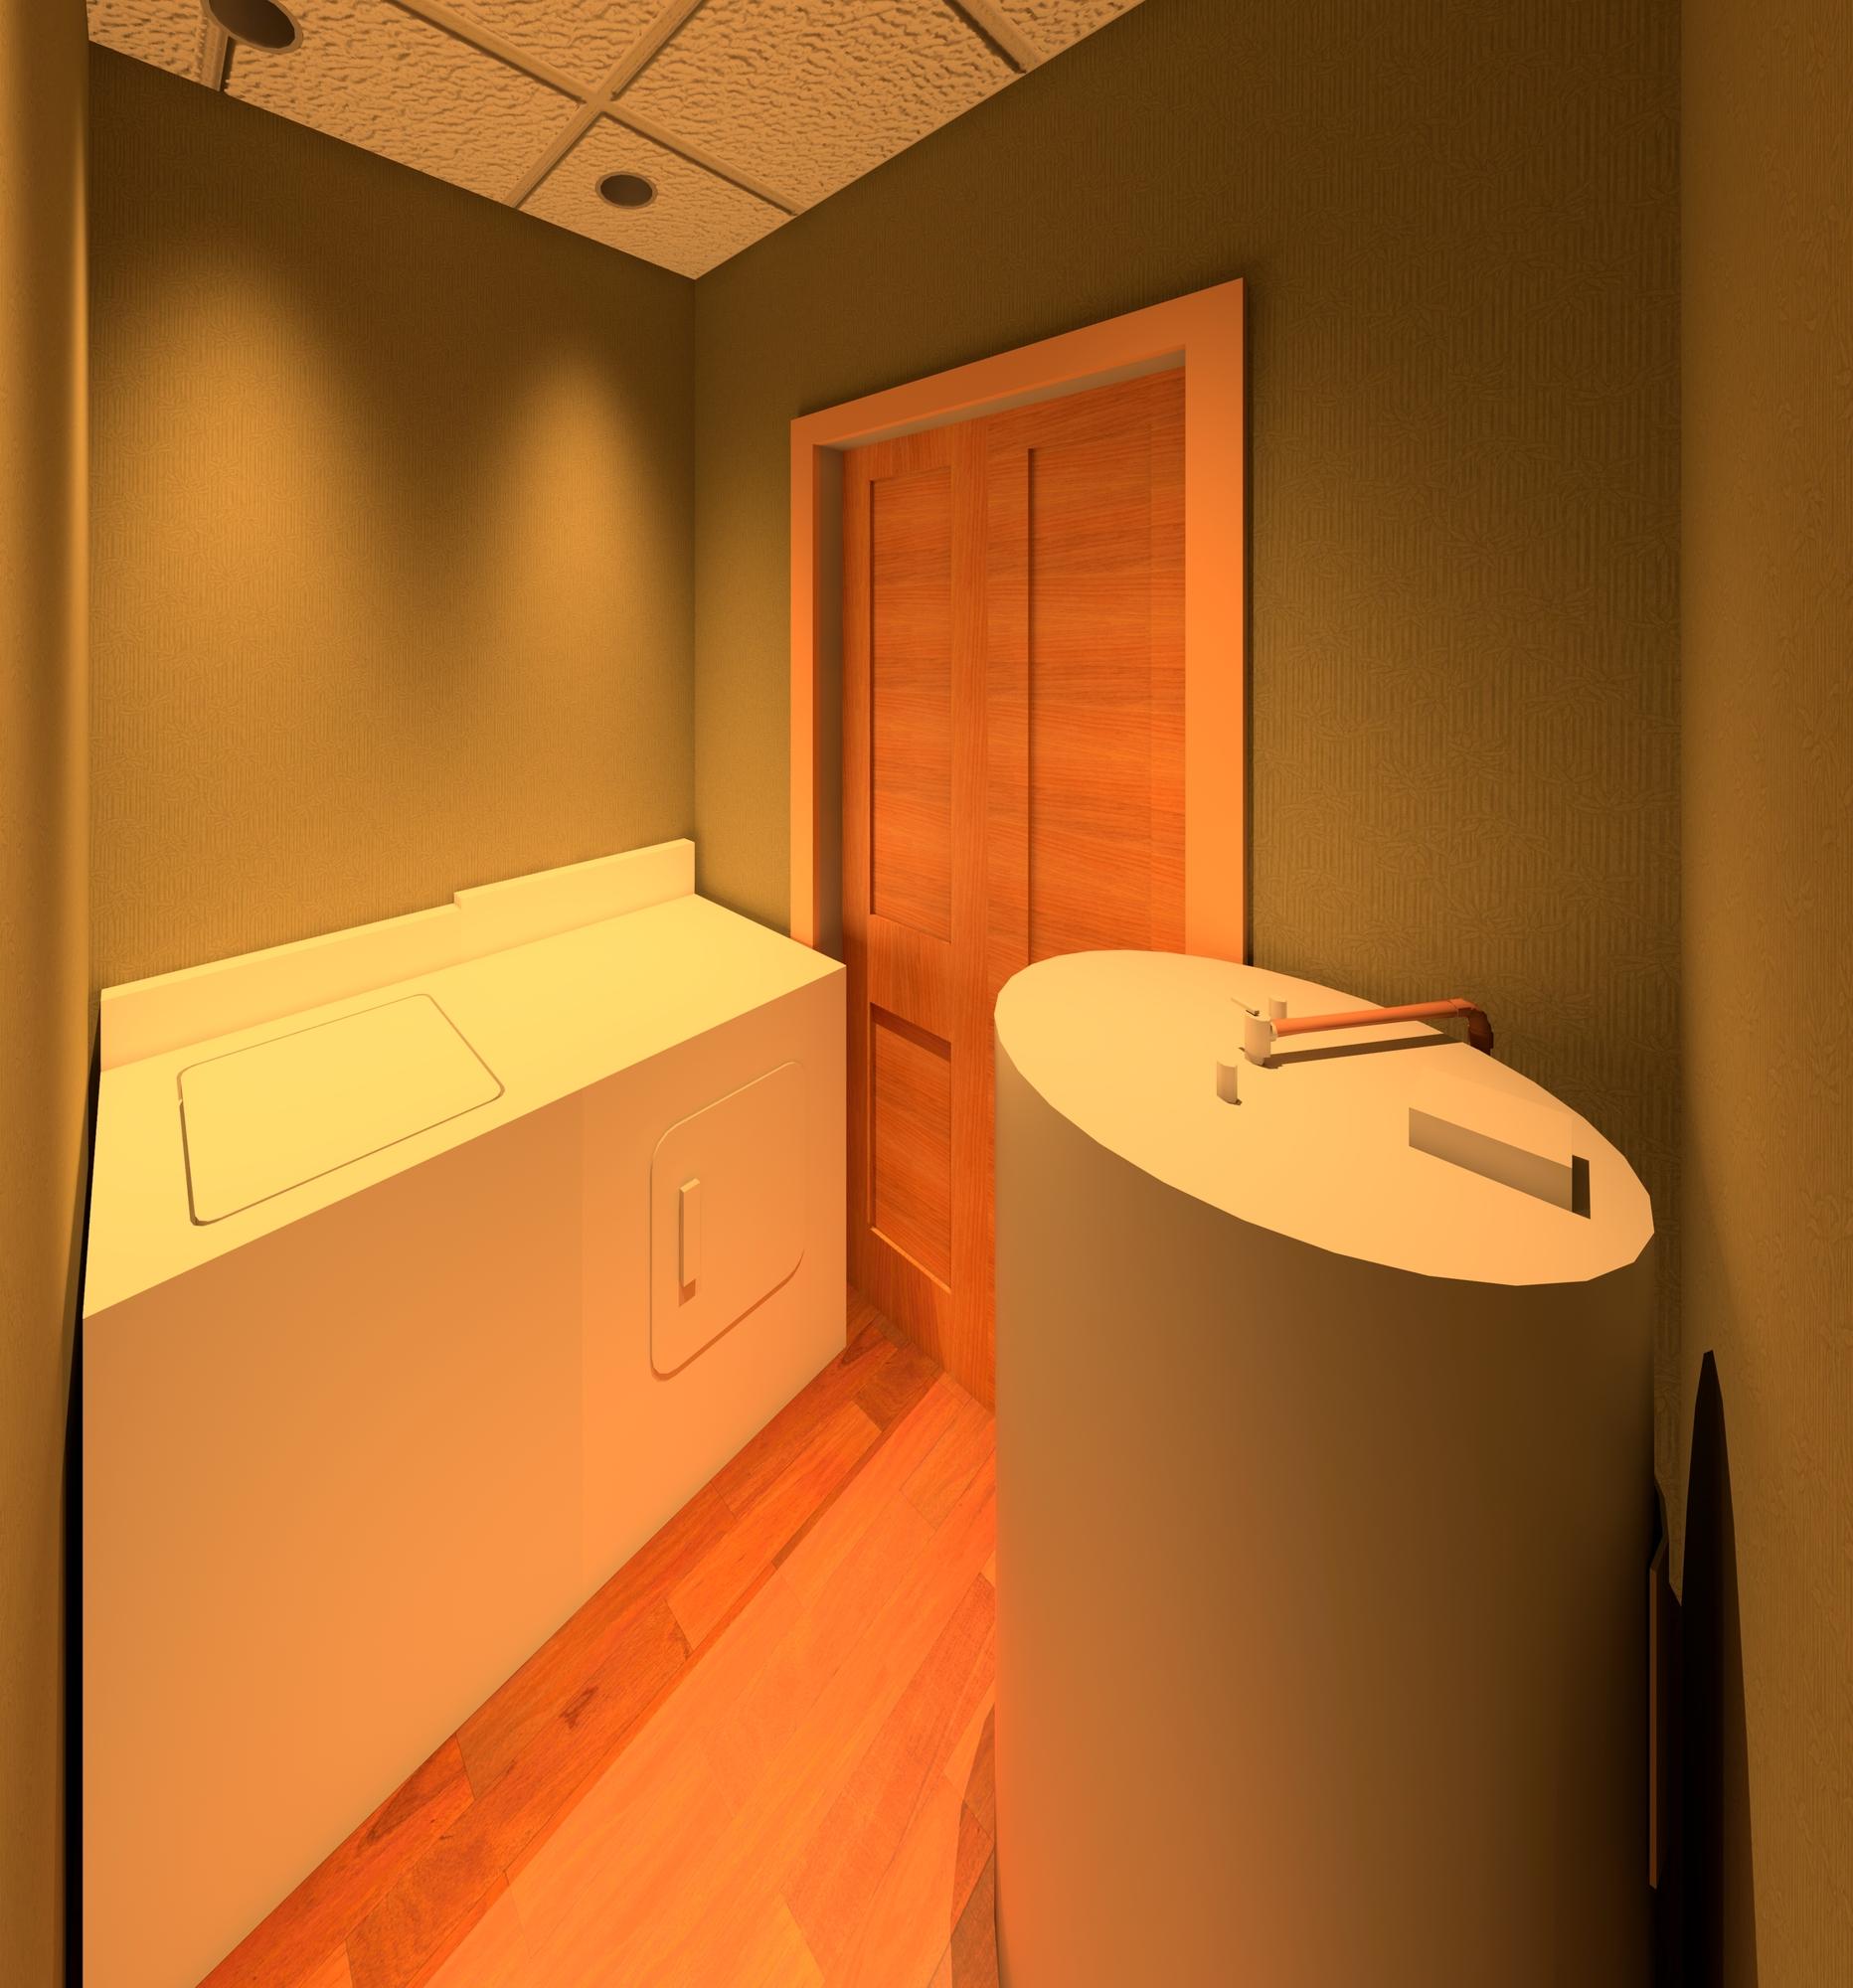 Raas-rendering20140930-8146-1hx0ebu